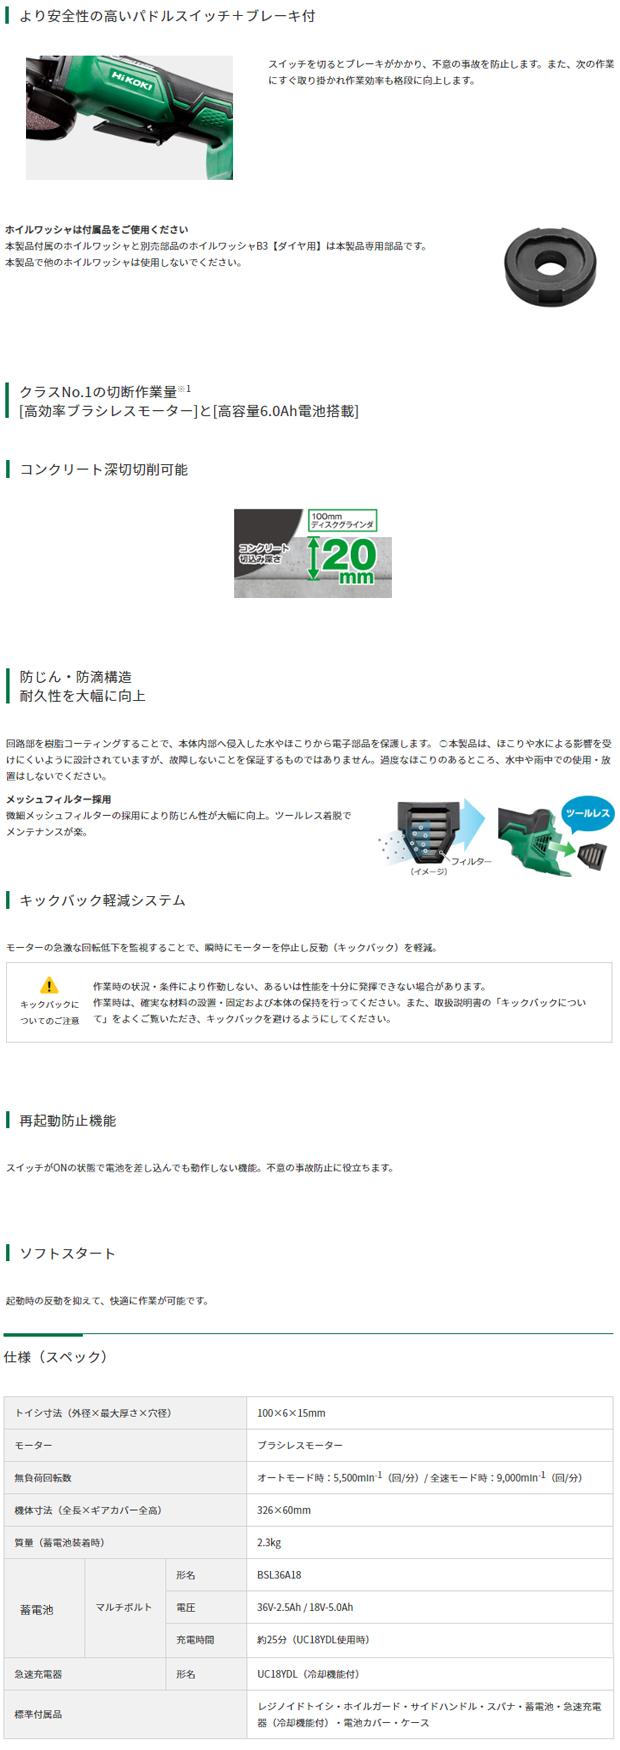 HiKOKI コードレスディスクグラインダ(ブレーキ付) G18DBBAL